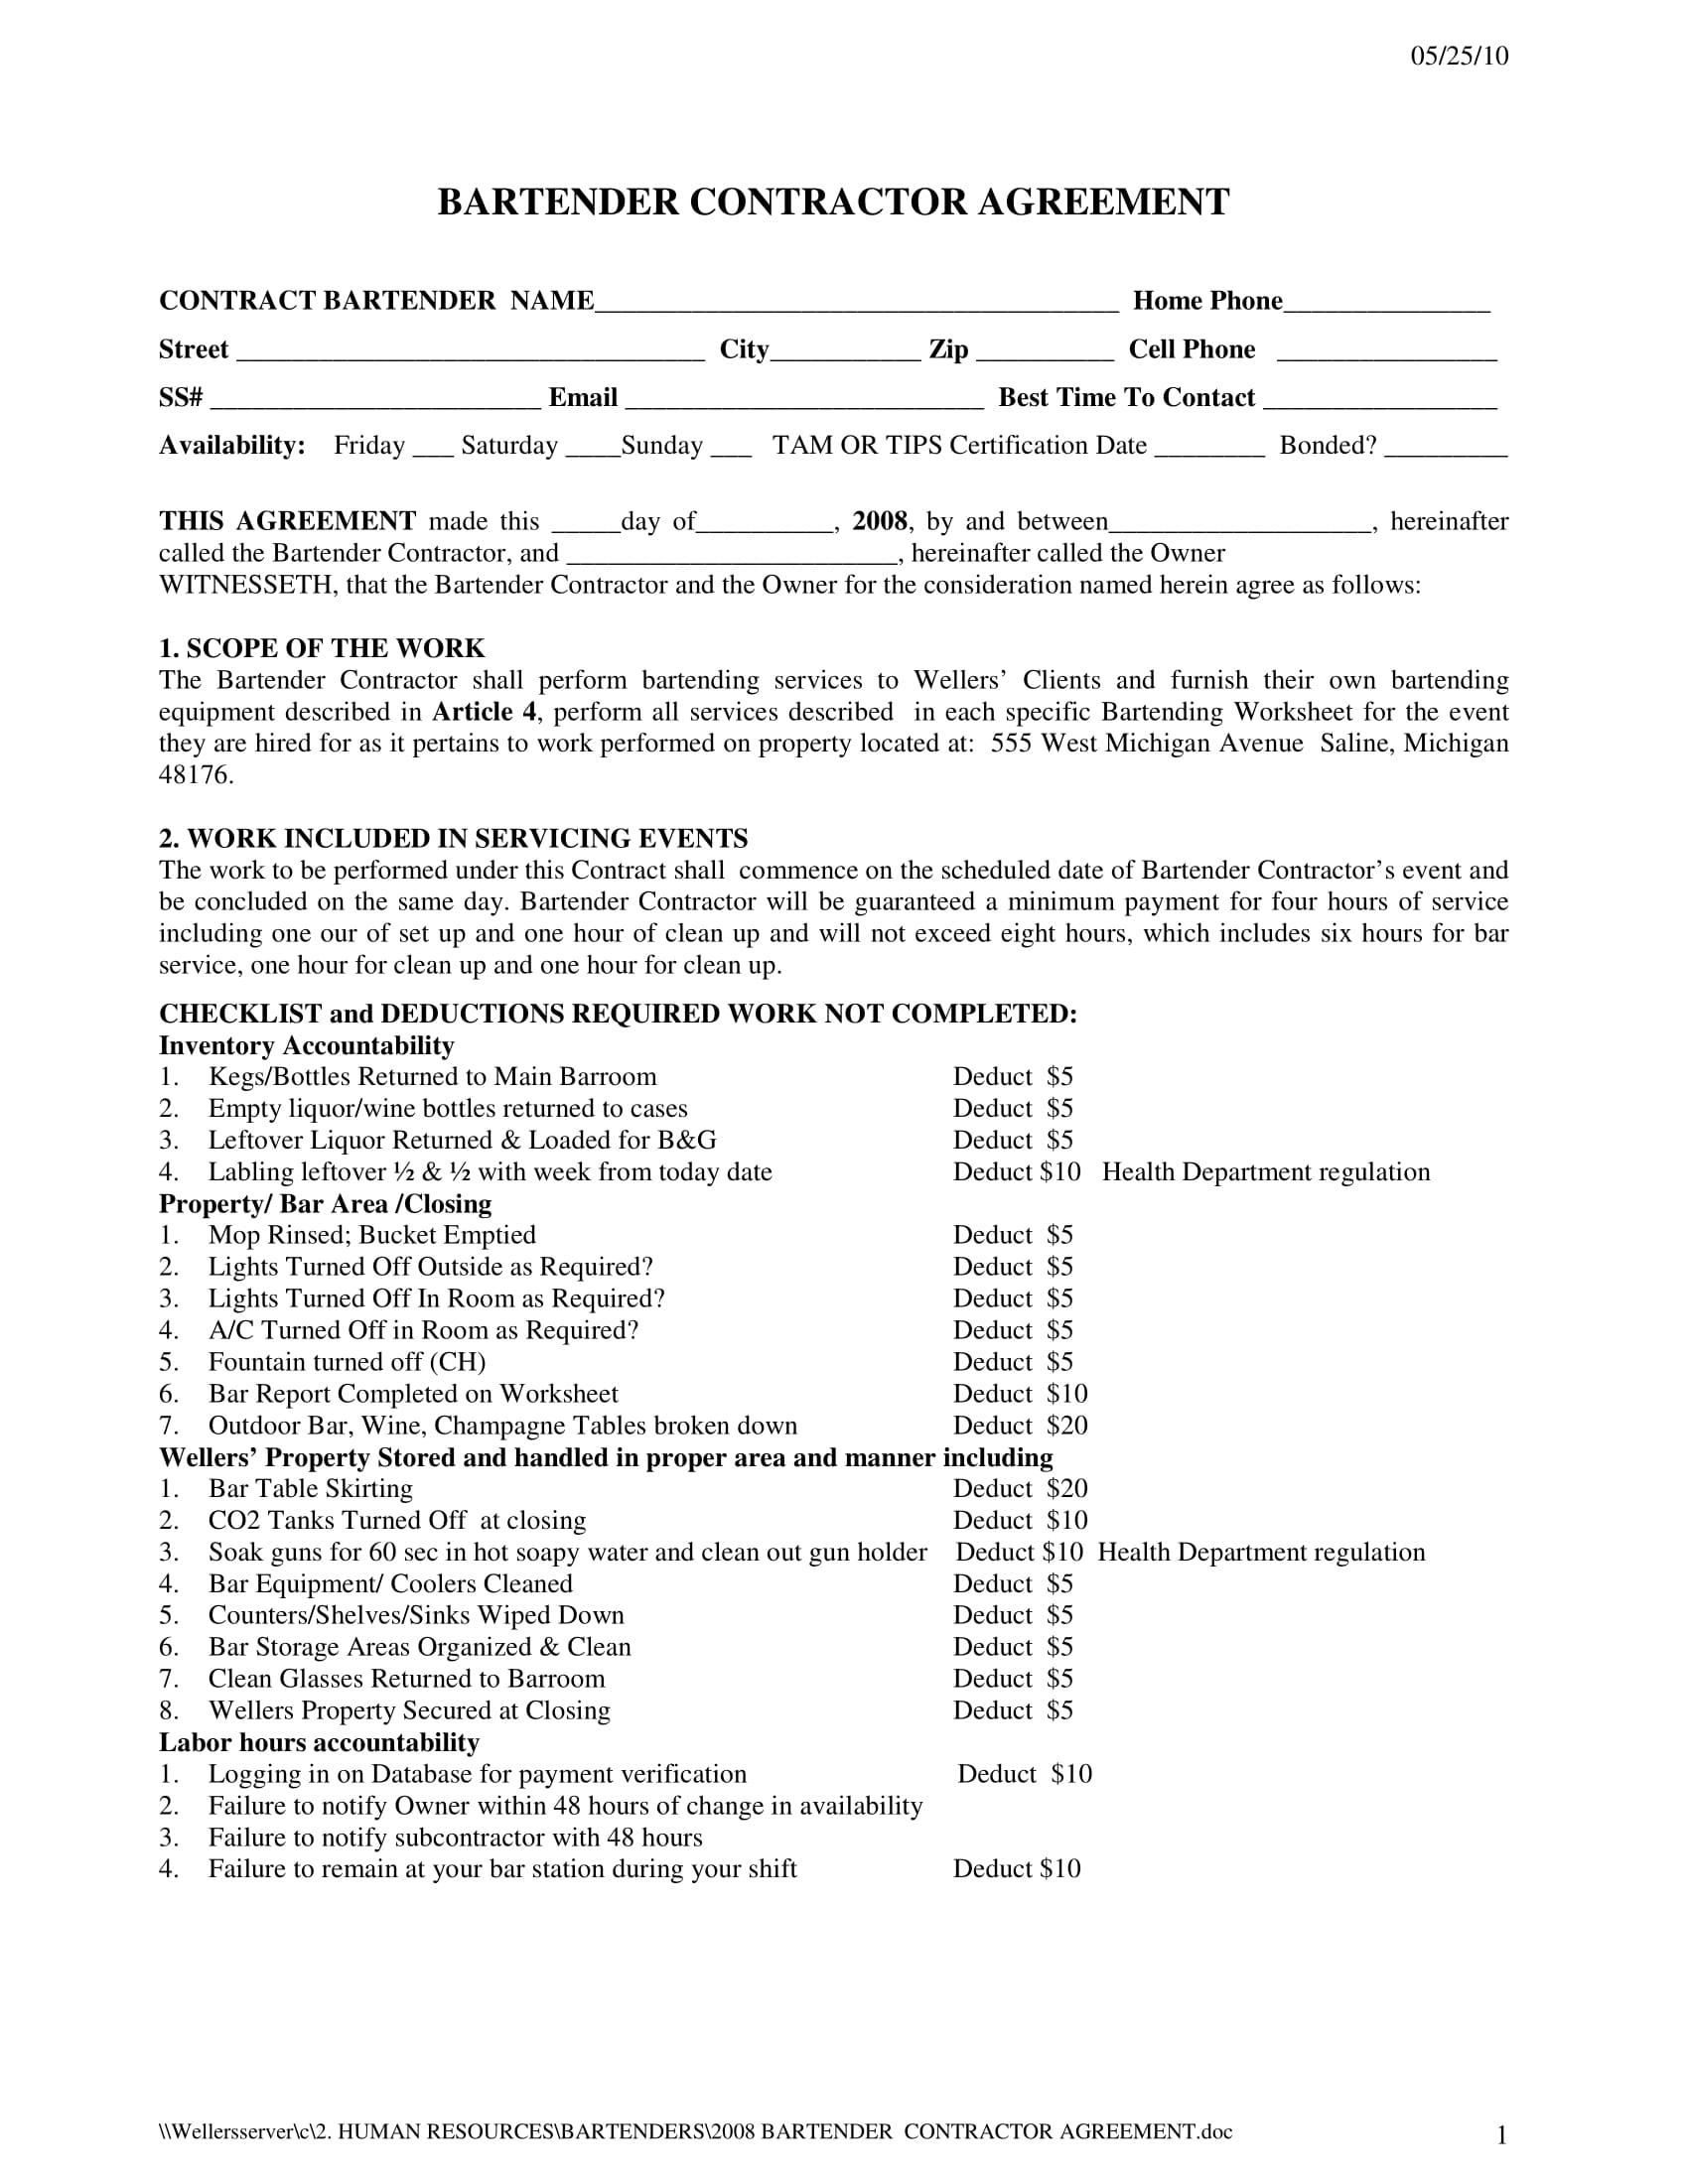 bartender contractor agreement form 1